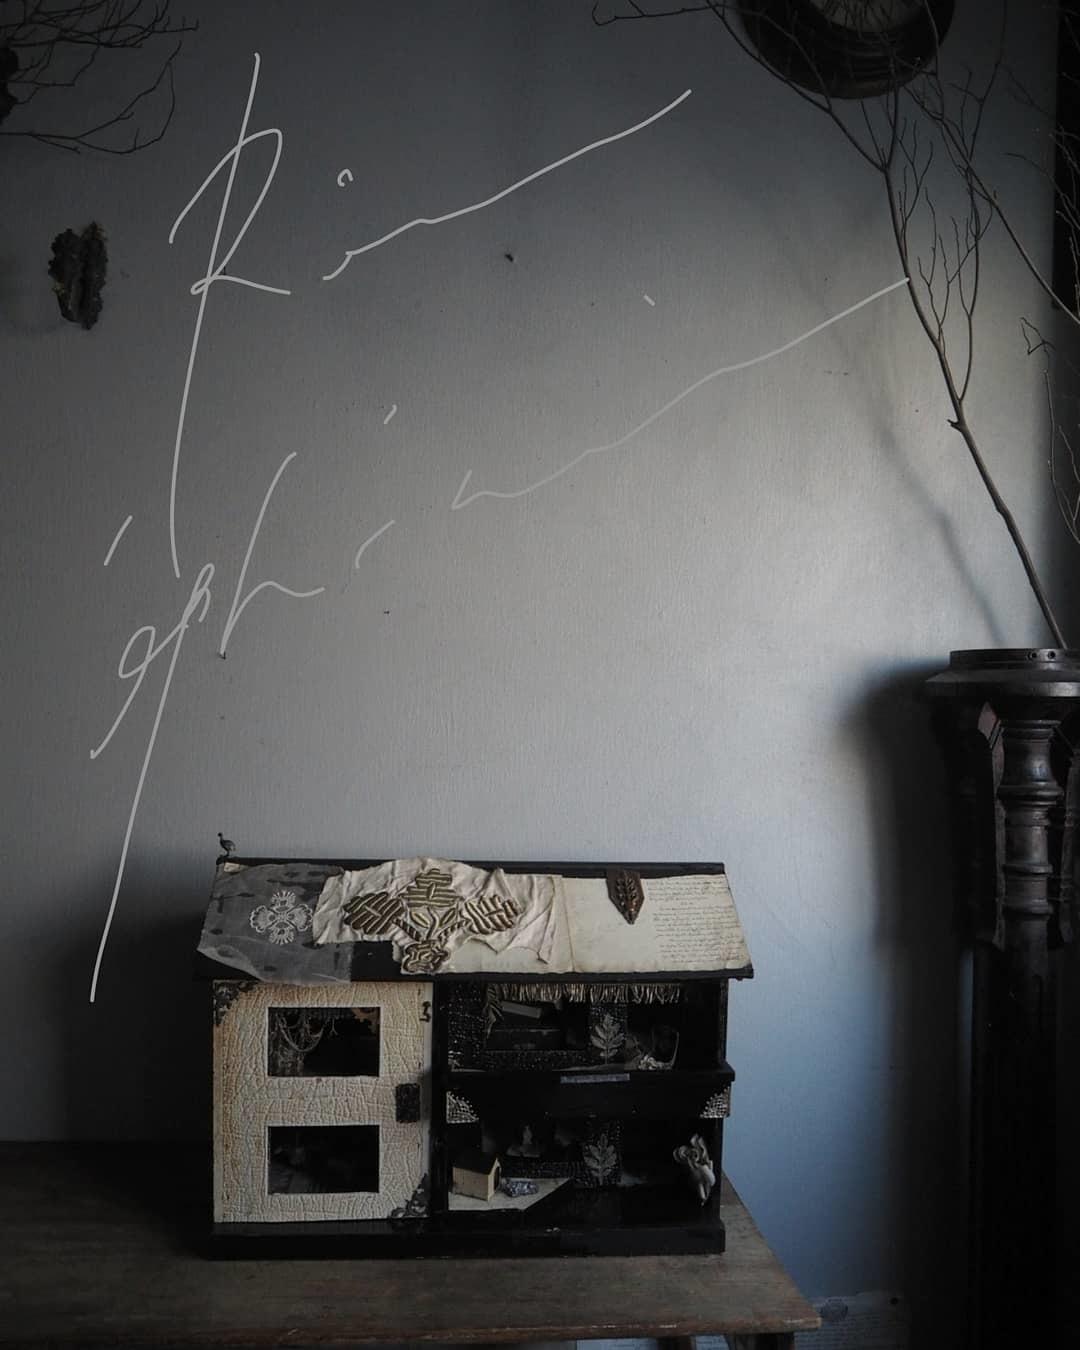 『Rêve éphémère』 ~儚い夢の時間~ 2_d0162257_09060227.jpg